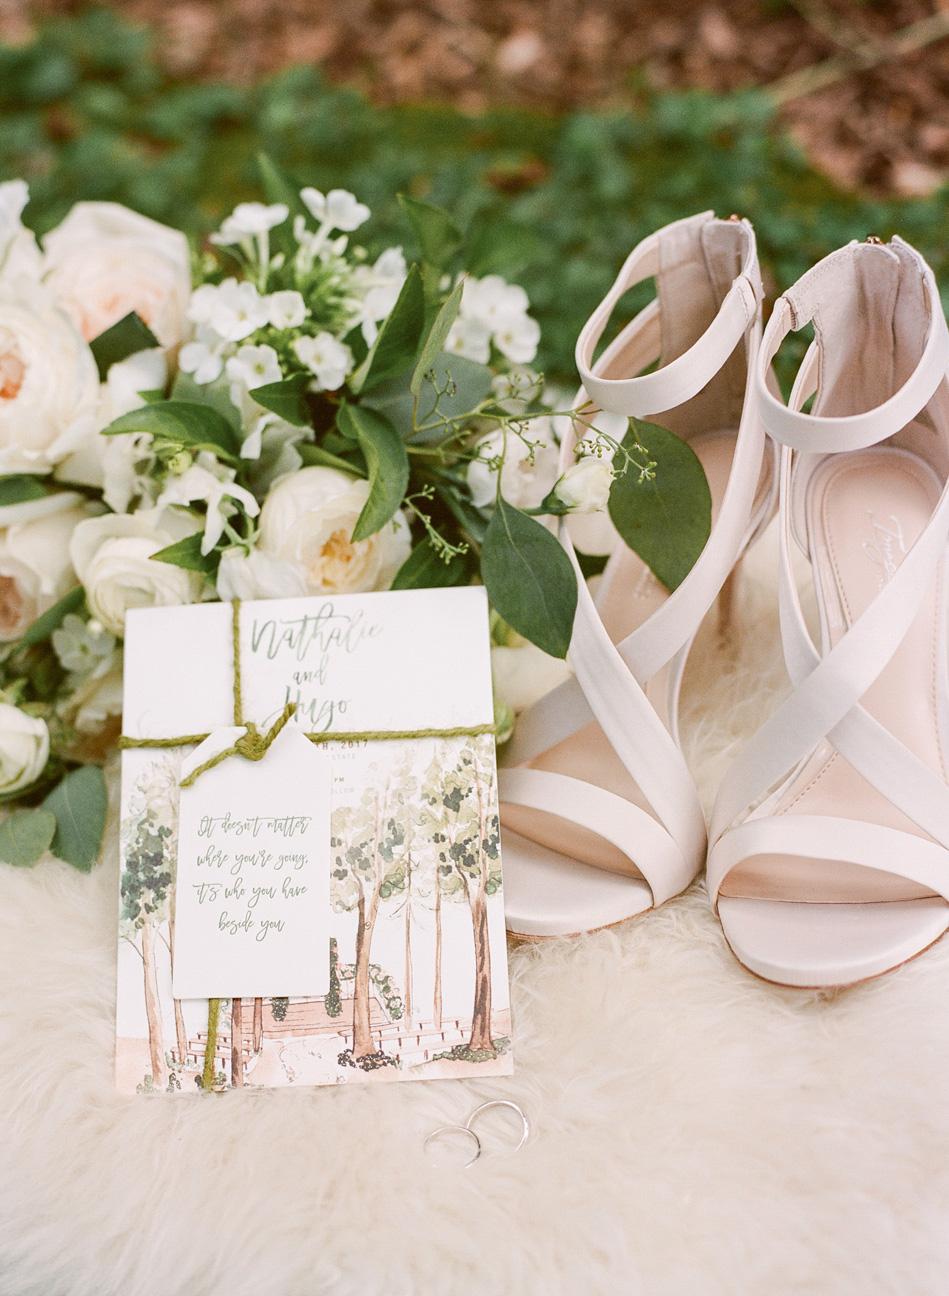 KarenHillPhotography-Parizat-Wedding-0034.jpg